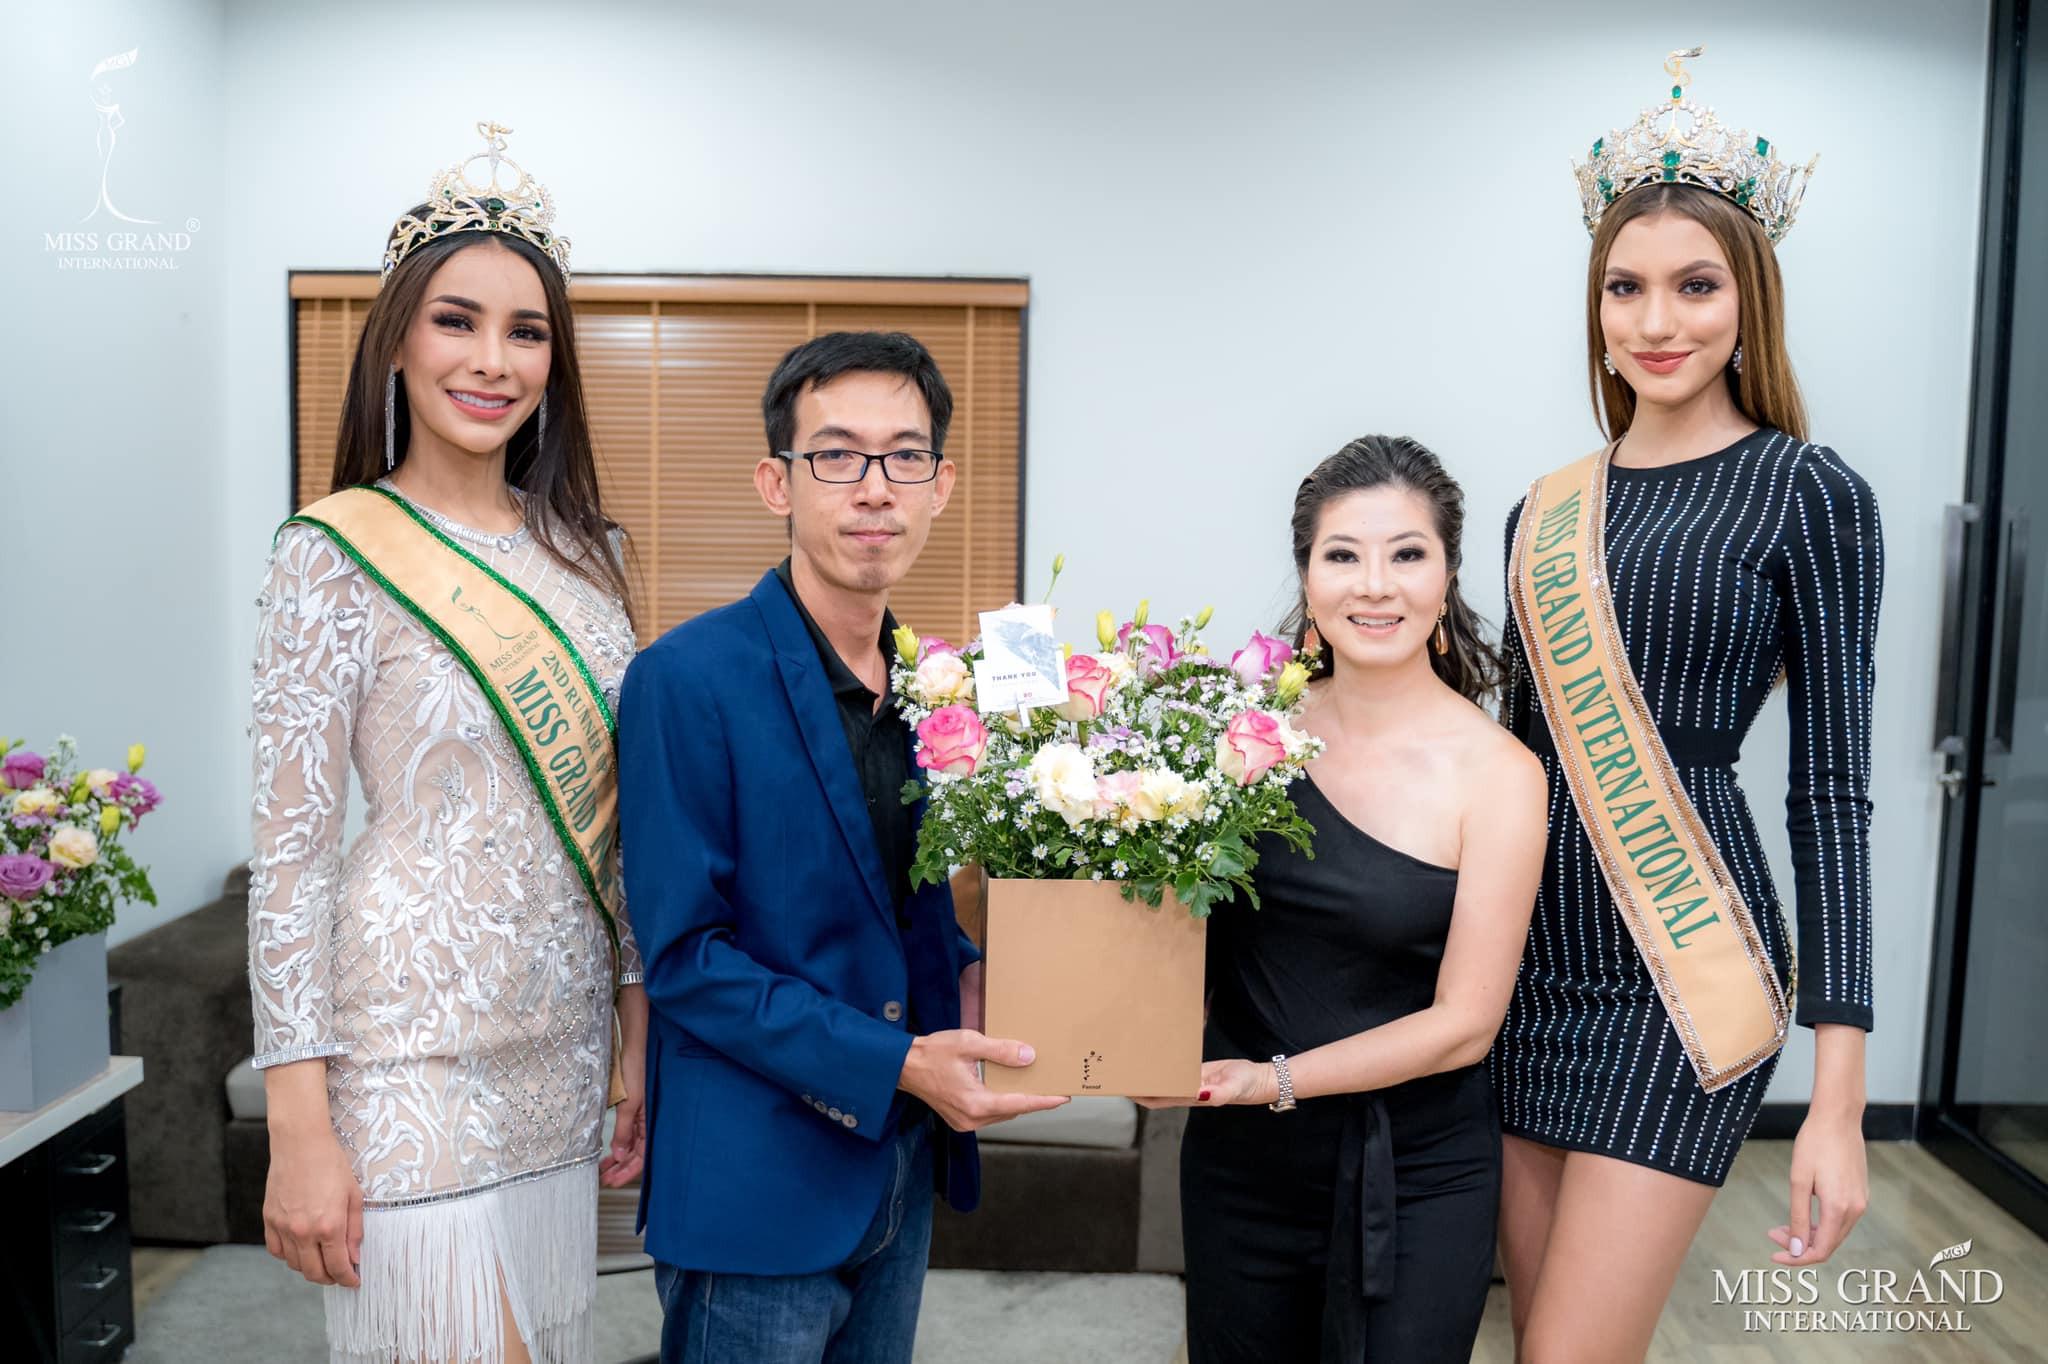 lourdes valentina figuera, miss grand international 2019. - Página 22 Fekzis10